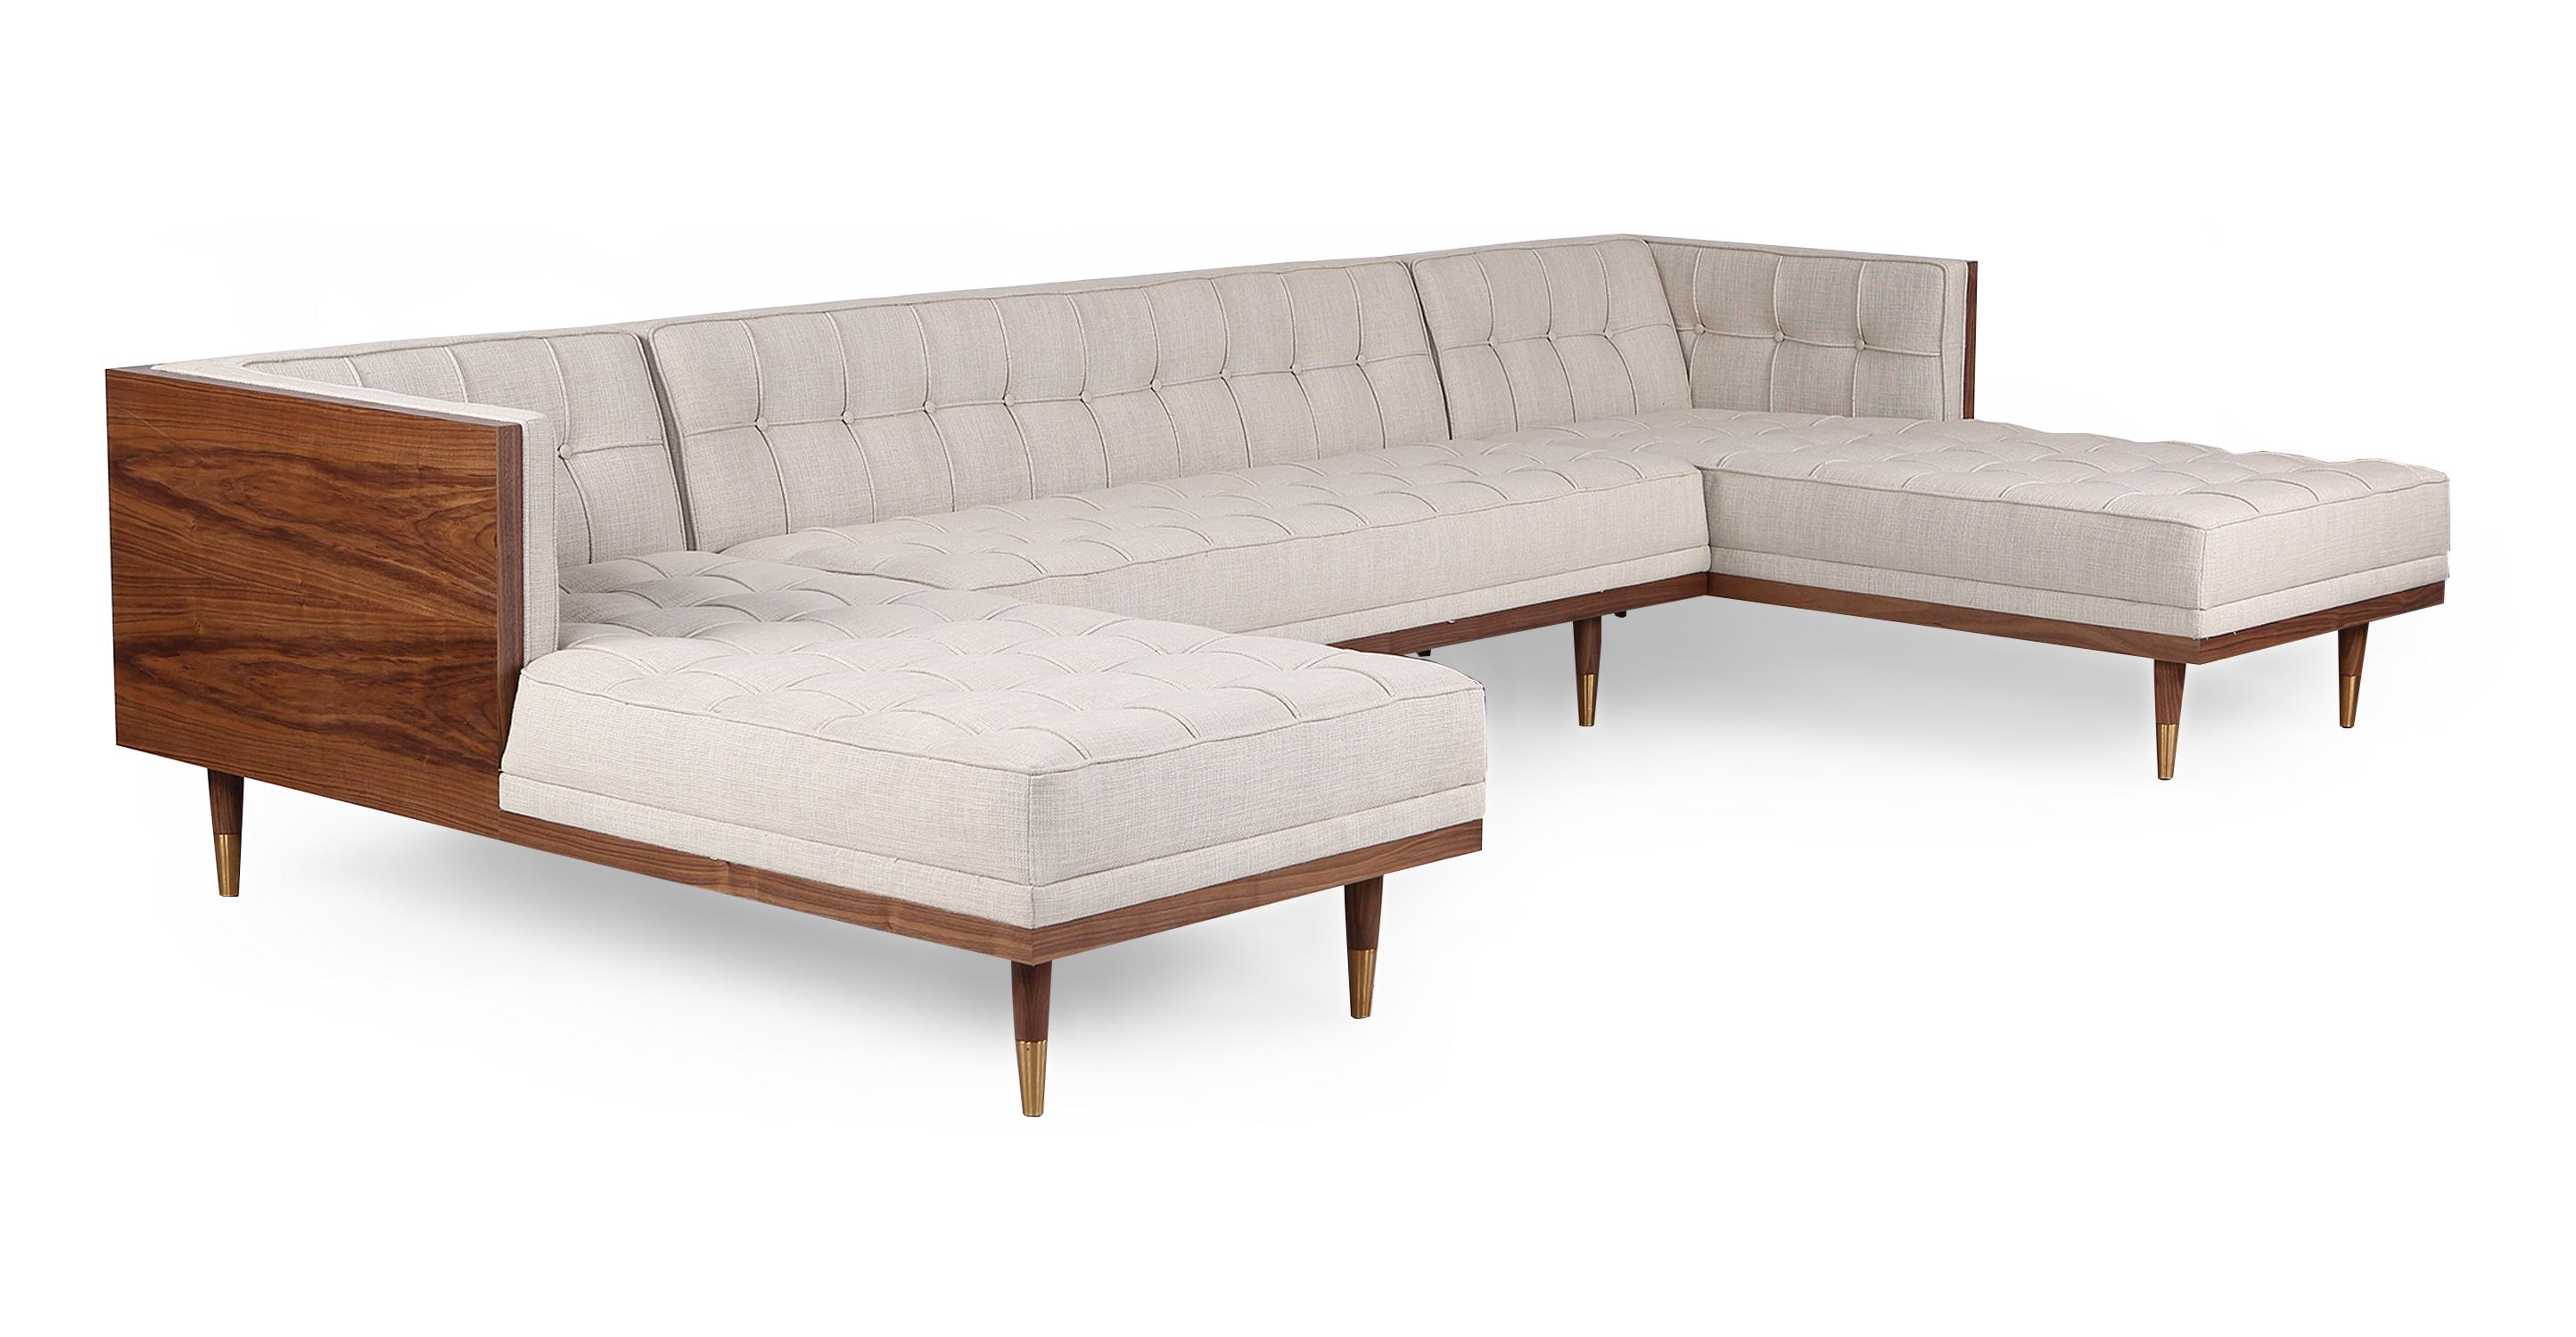 "Woodrow Box 126"" Fabric Sofa U-Sectional, Walnut/Urban Hemp"